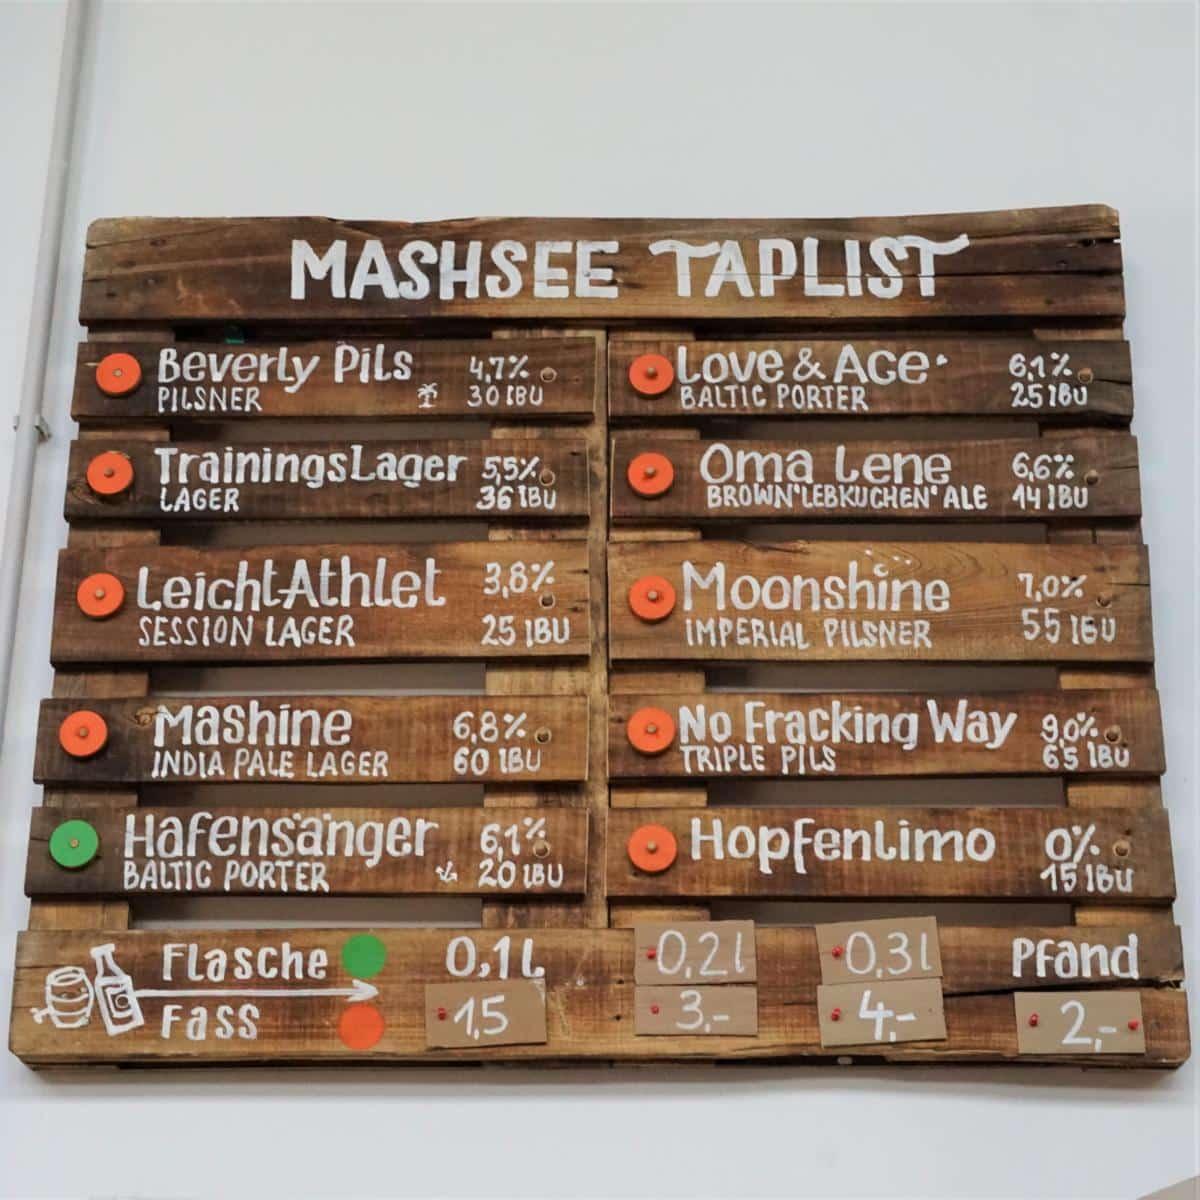 Style Hannover Mashsee Brauerei 3 - Mashsee Brauerei – Craft Beer aus Hannover